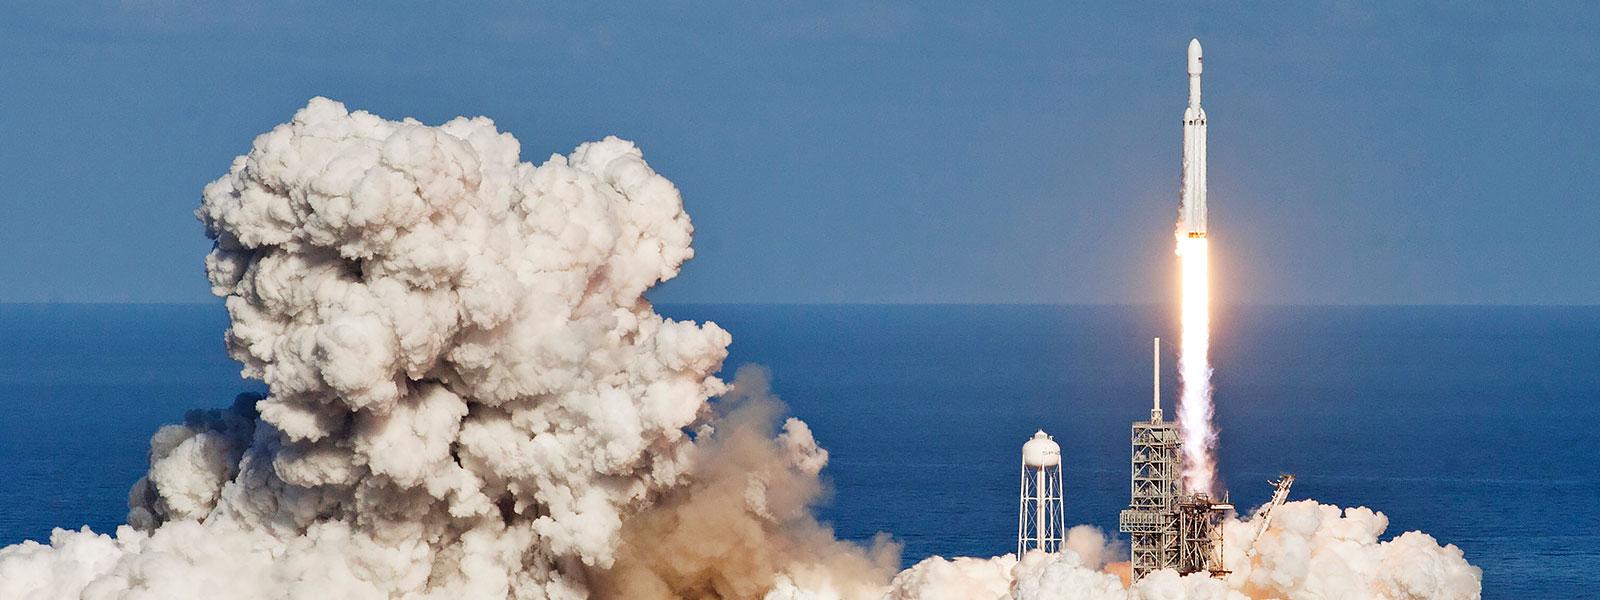 Product Launching Rocket